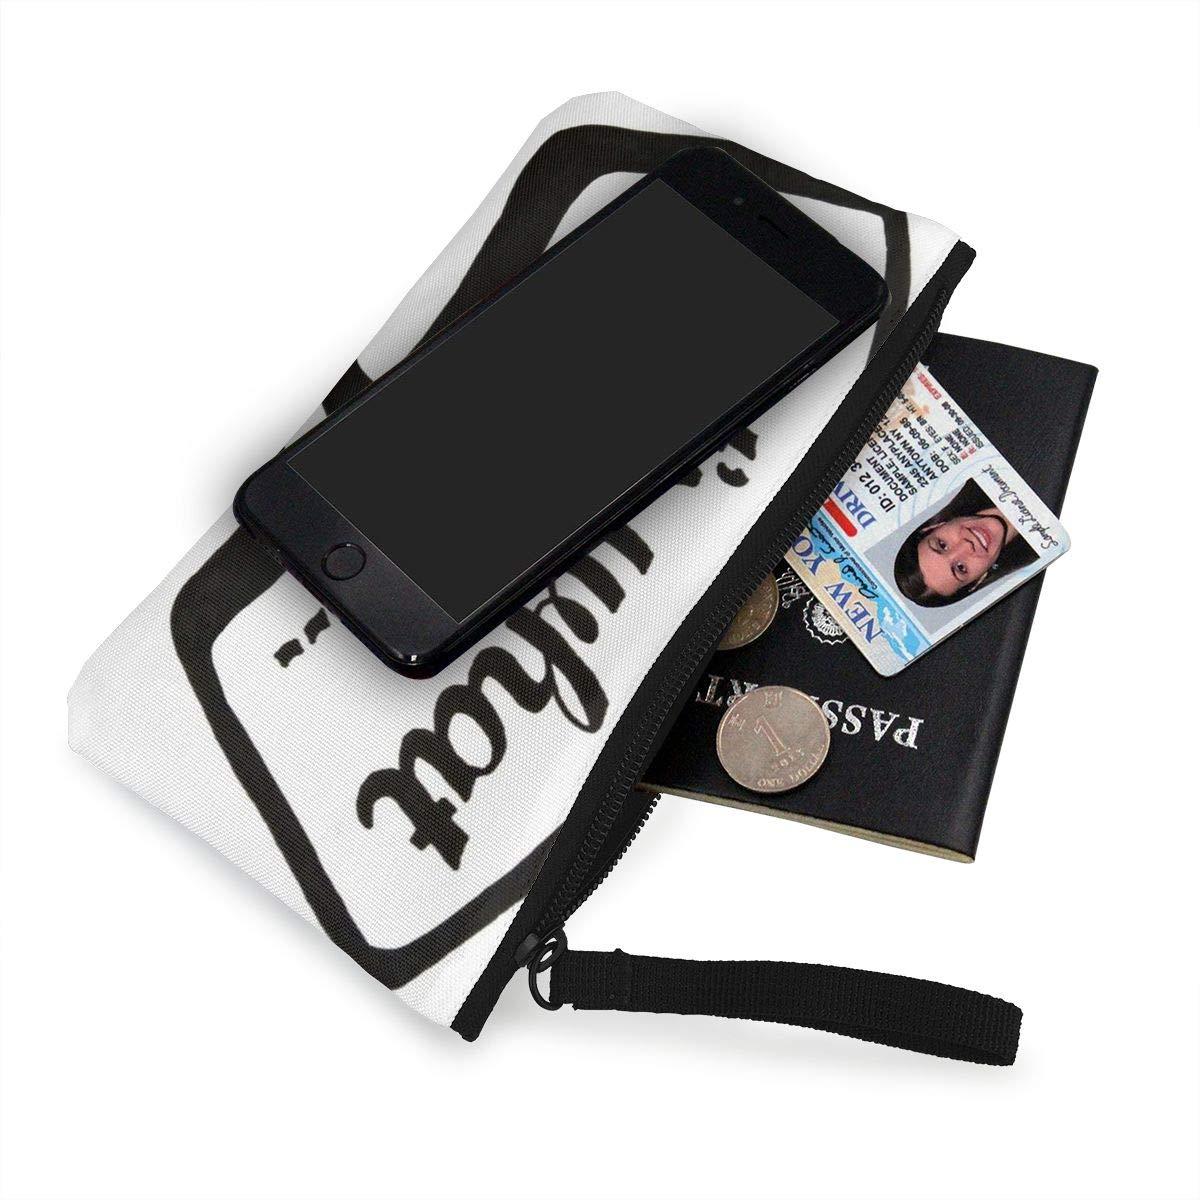 Canvas Cash Coin Purse,Thats He Said Print Make Up Bag Zipper Small Purse Wallets